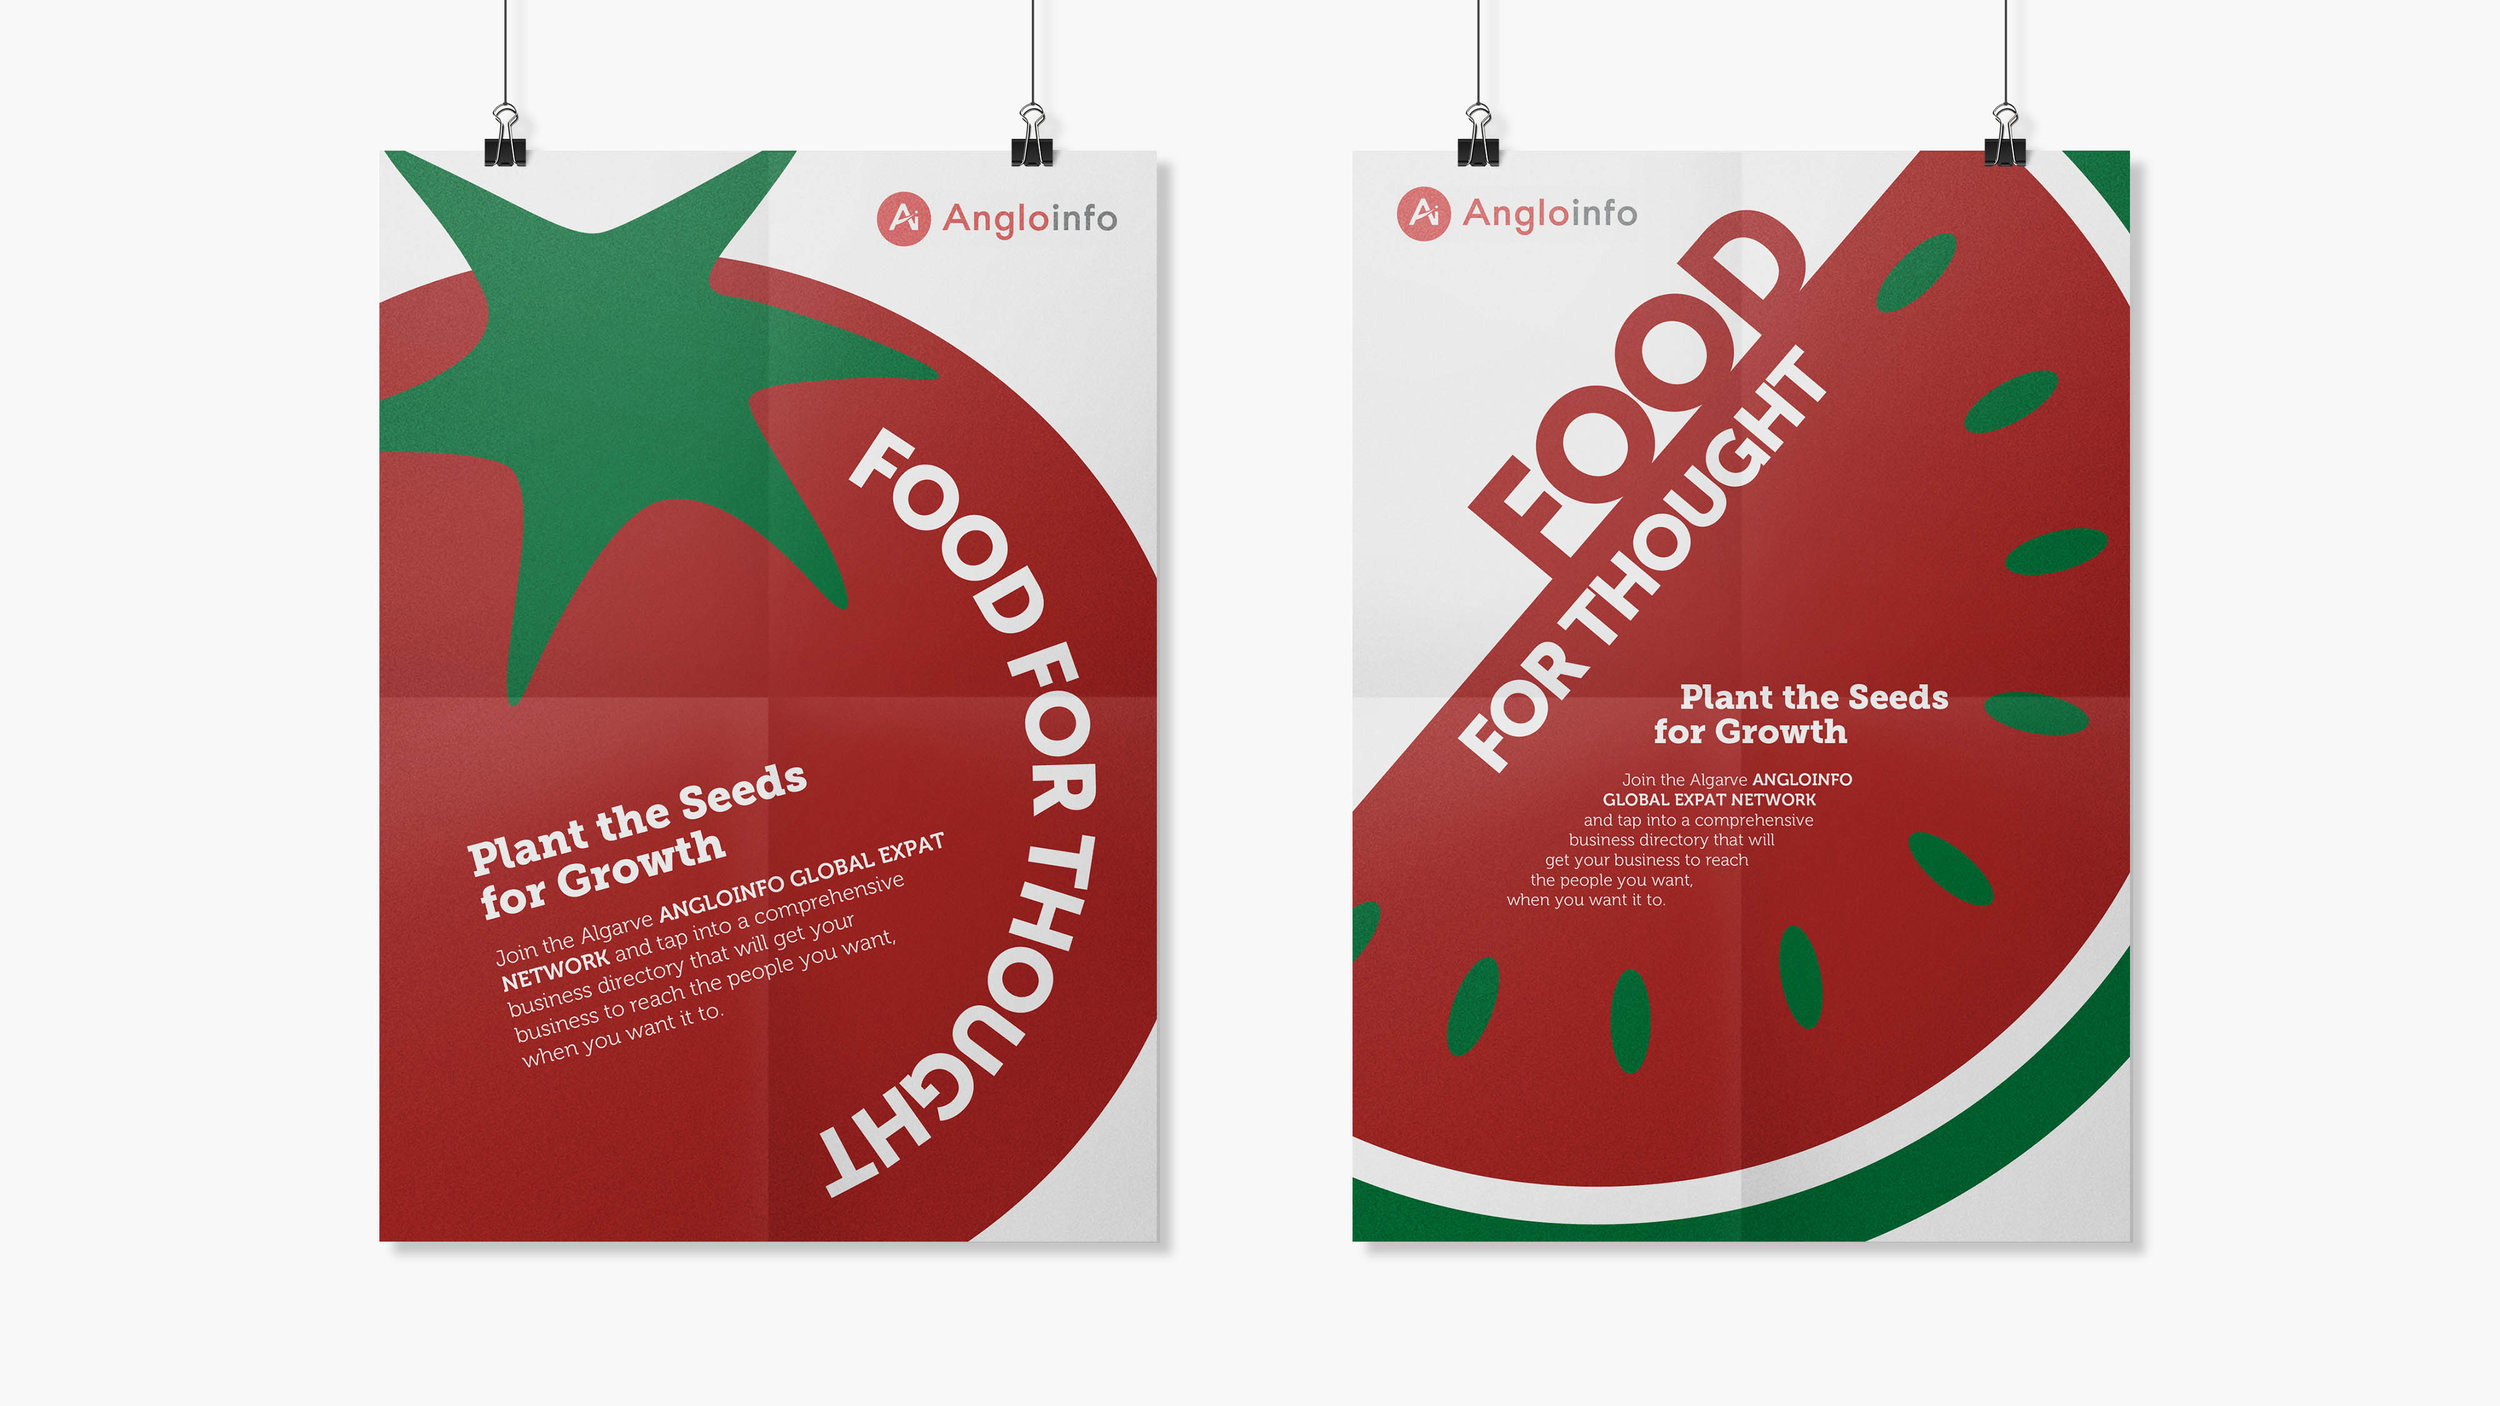 Brand_republica_poster_design_campaign_angloinfo.jpg